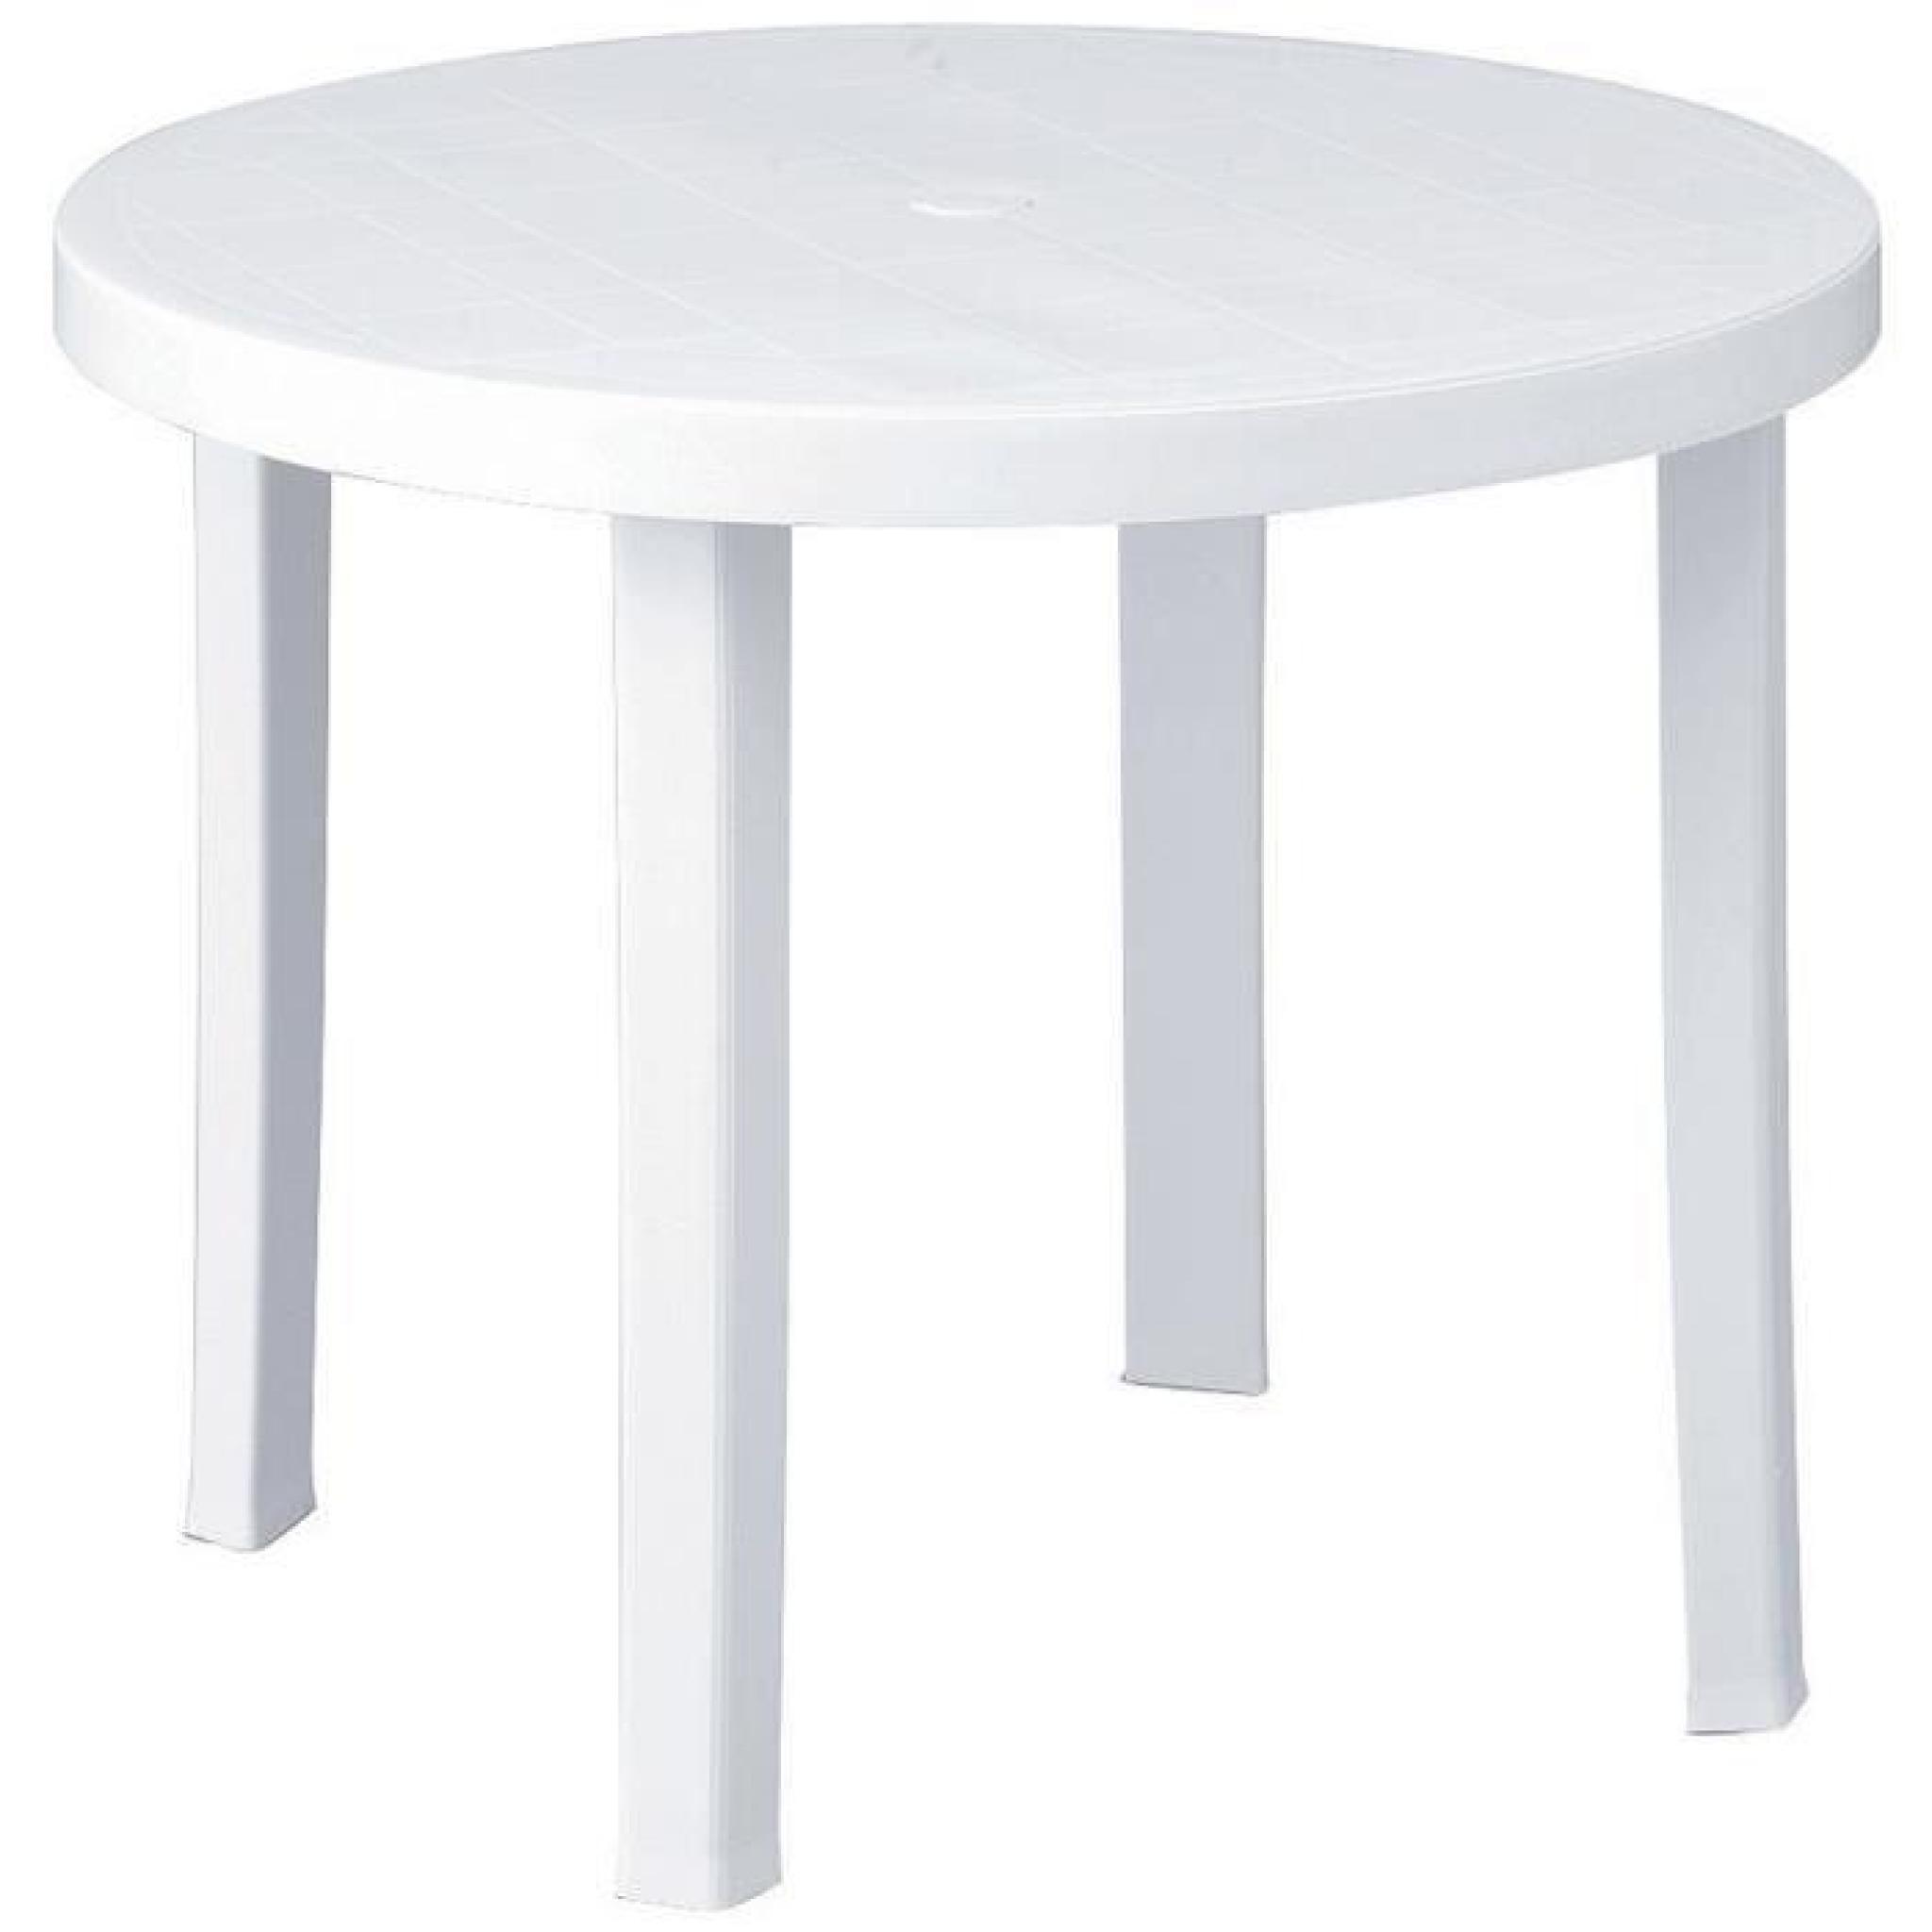 Table Ronde 90 Cm serapportantà Table Ronde Jardin Pas Cher